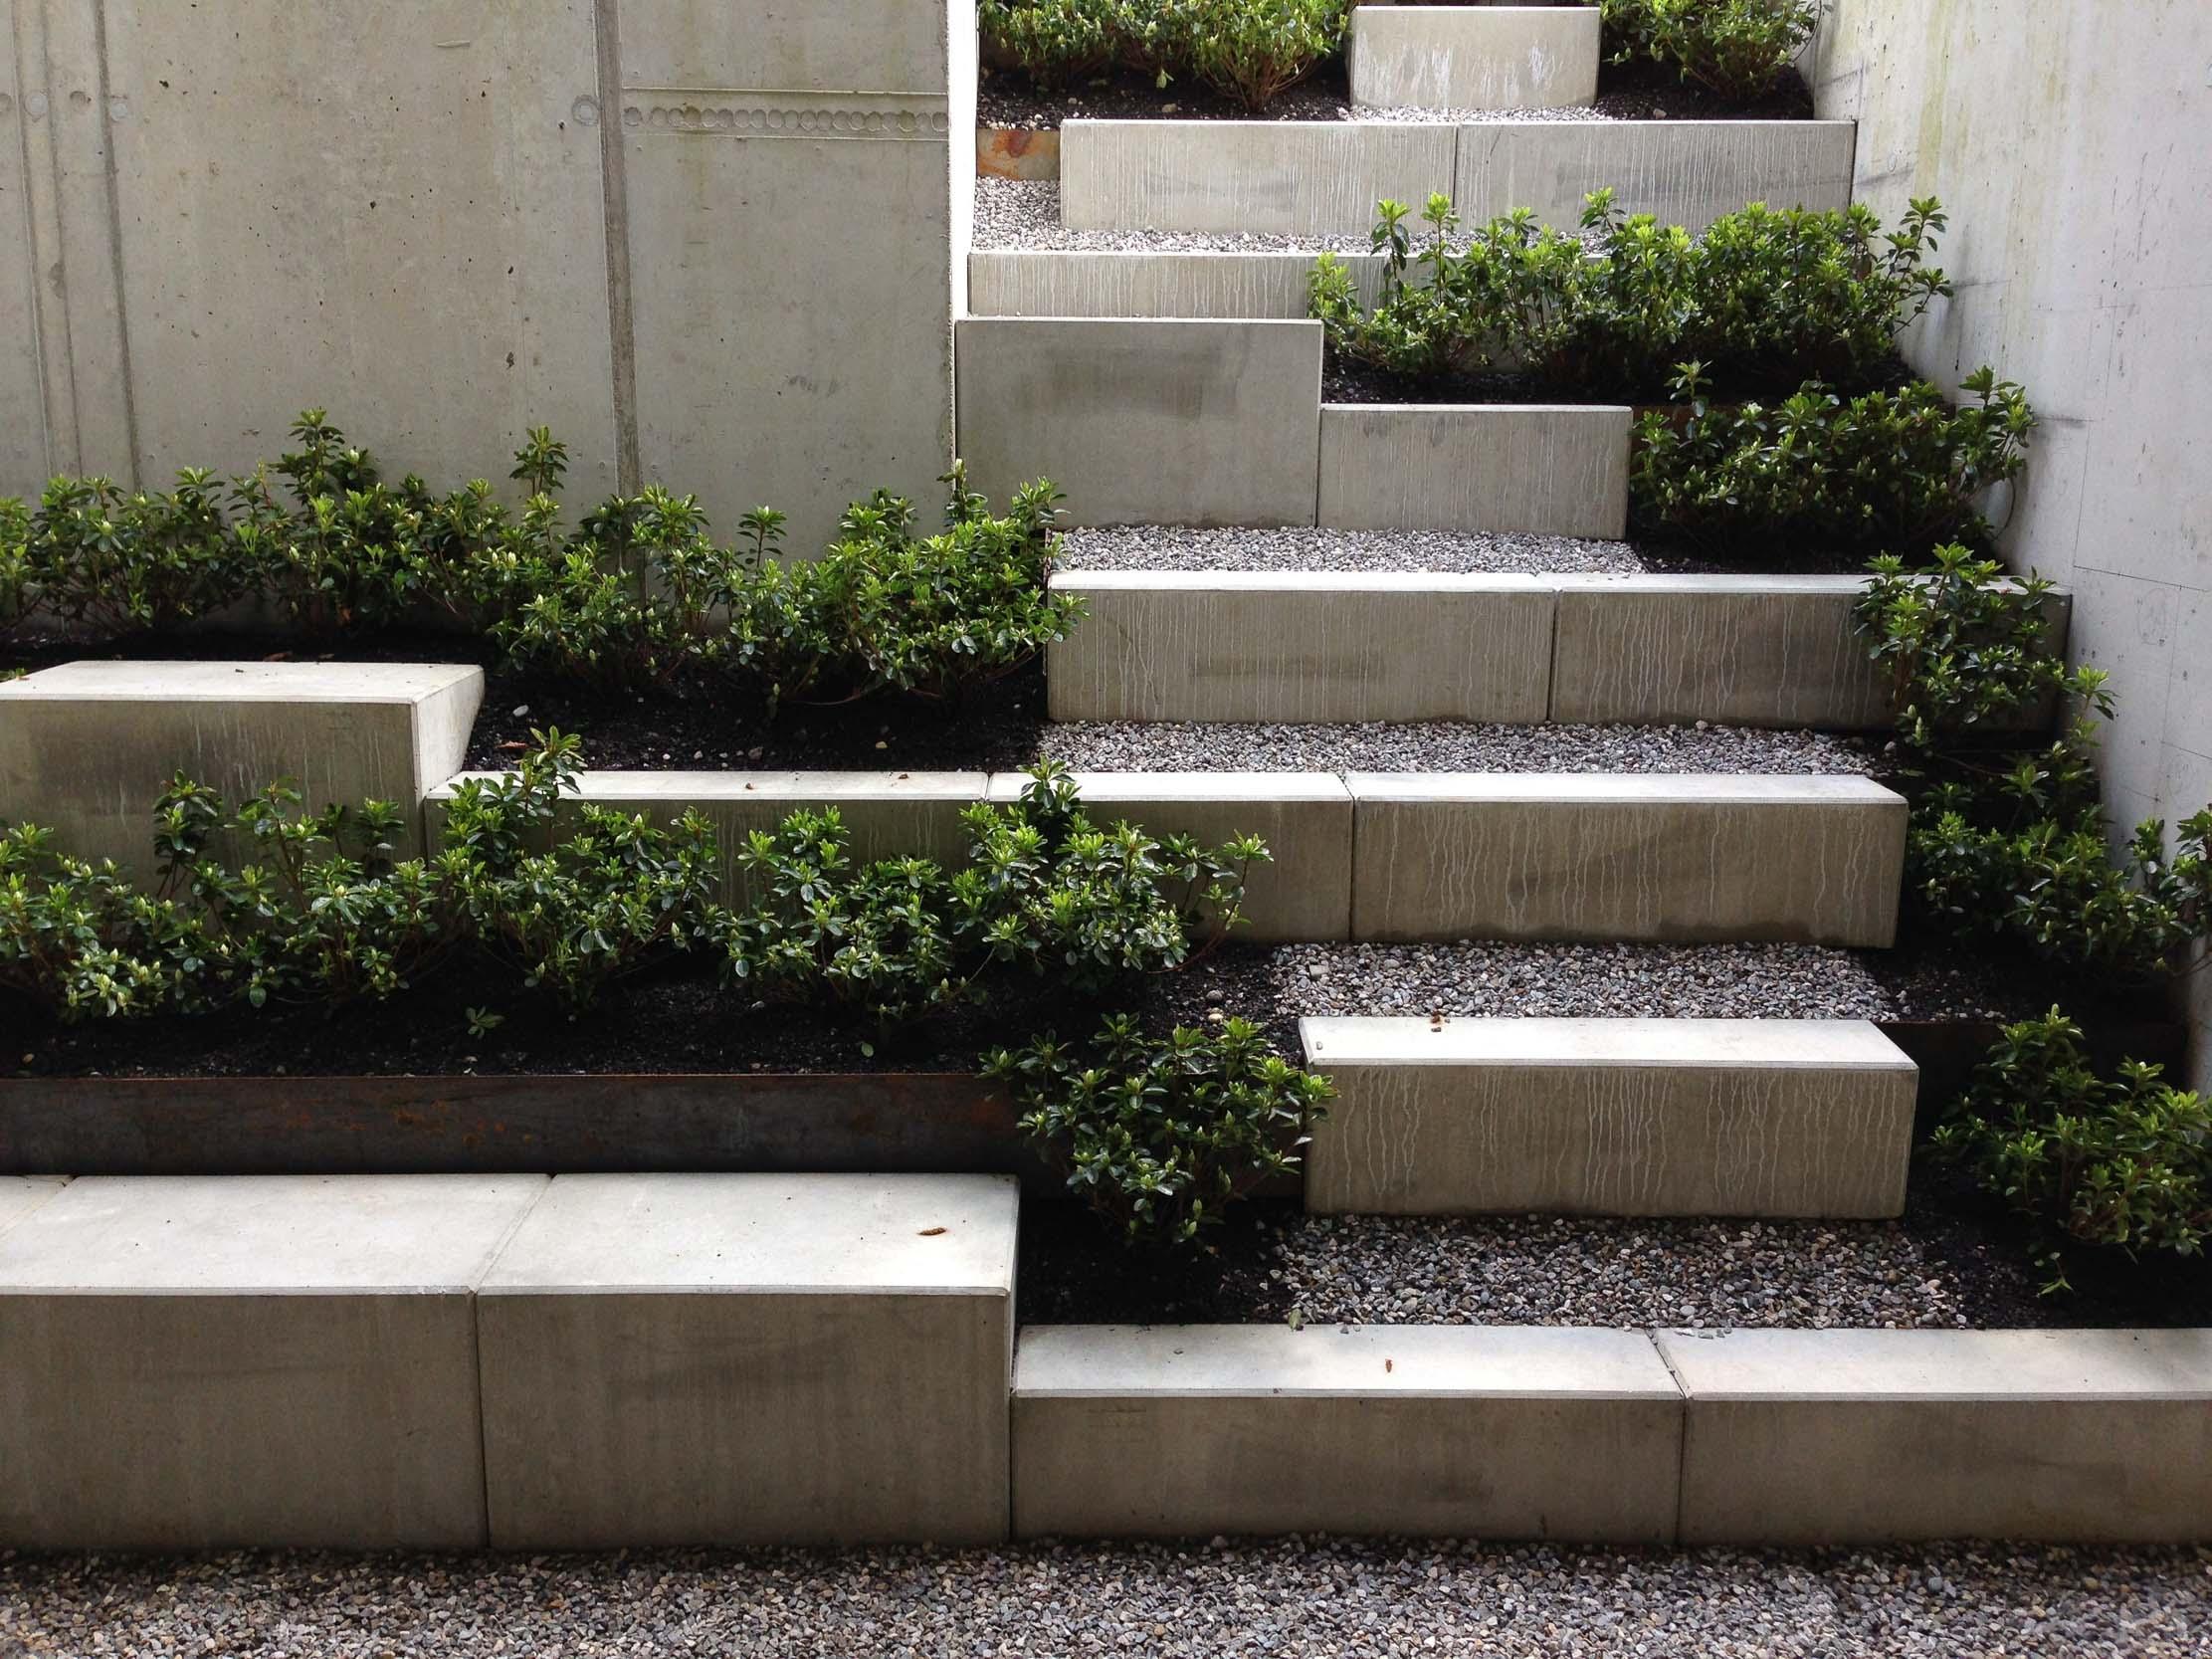 DOMO-Garten-9.jpg